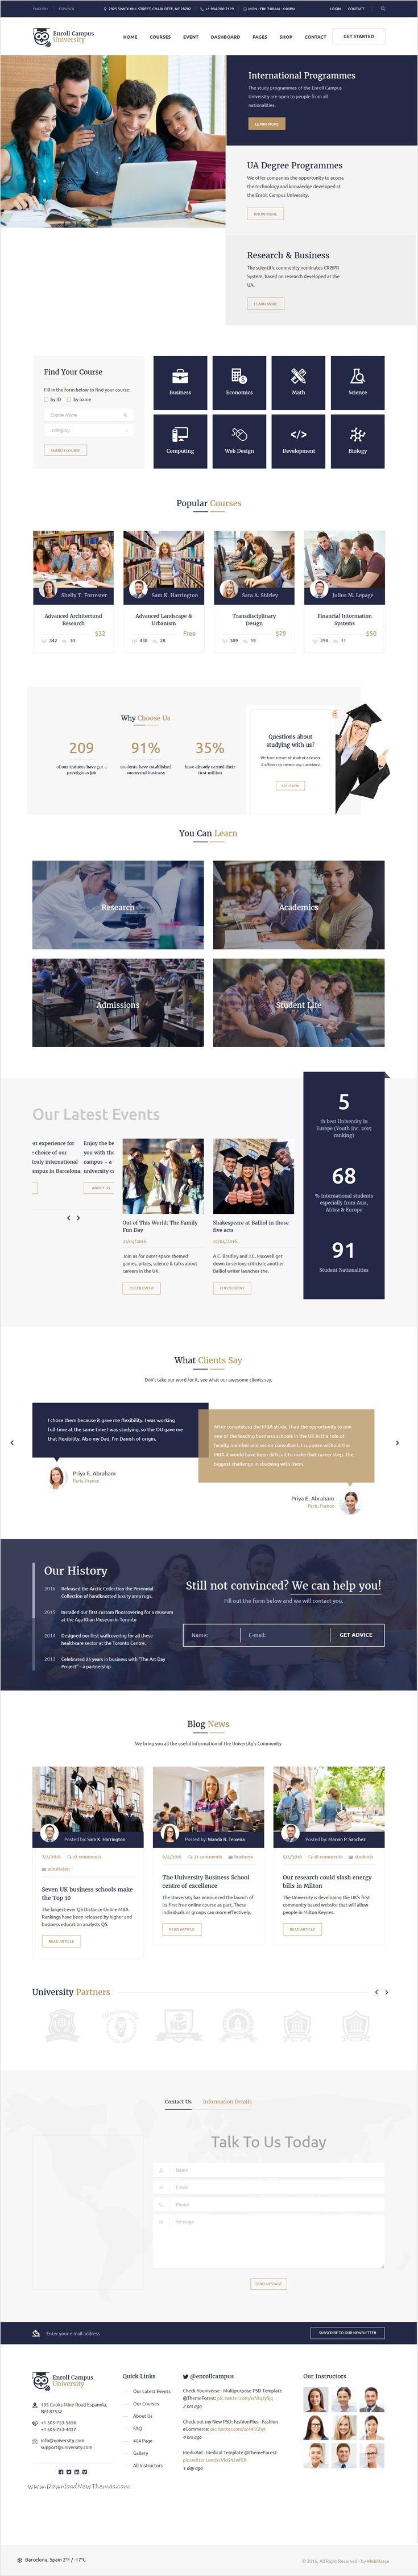 Learning Management Enroll University Education Template Great Website Design Web Design Tips Webpage Design